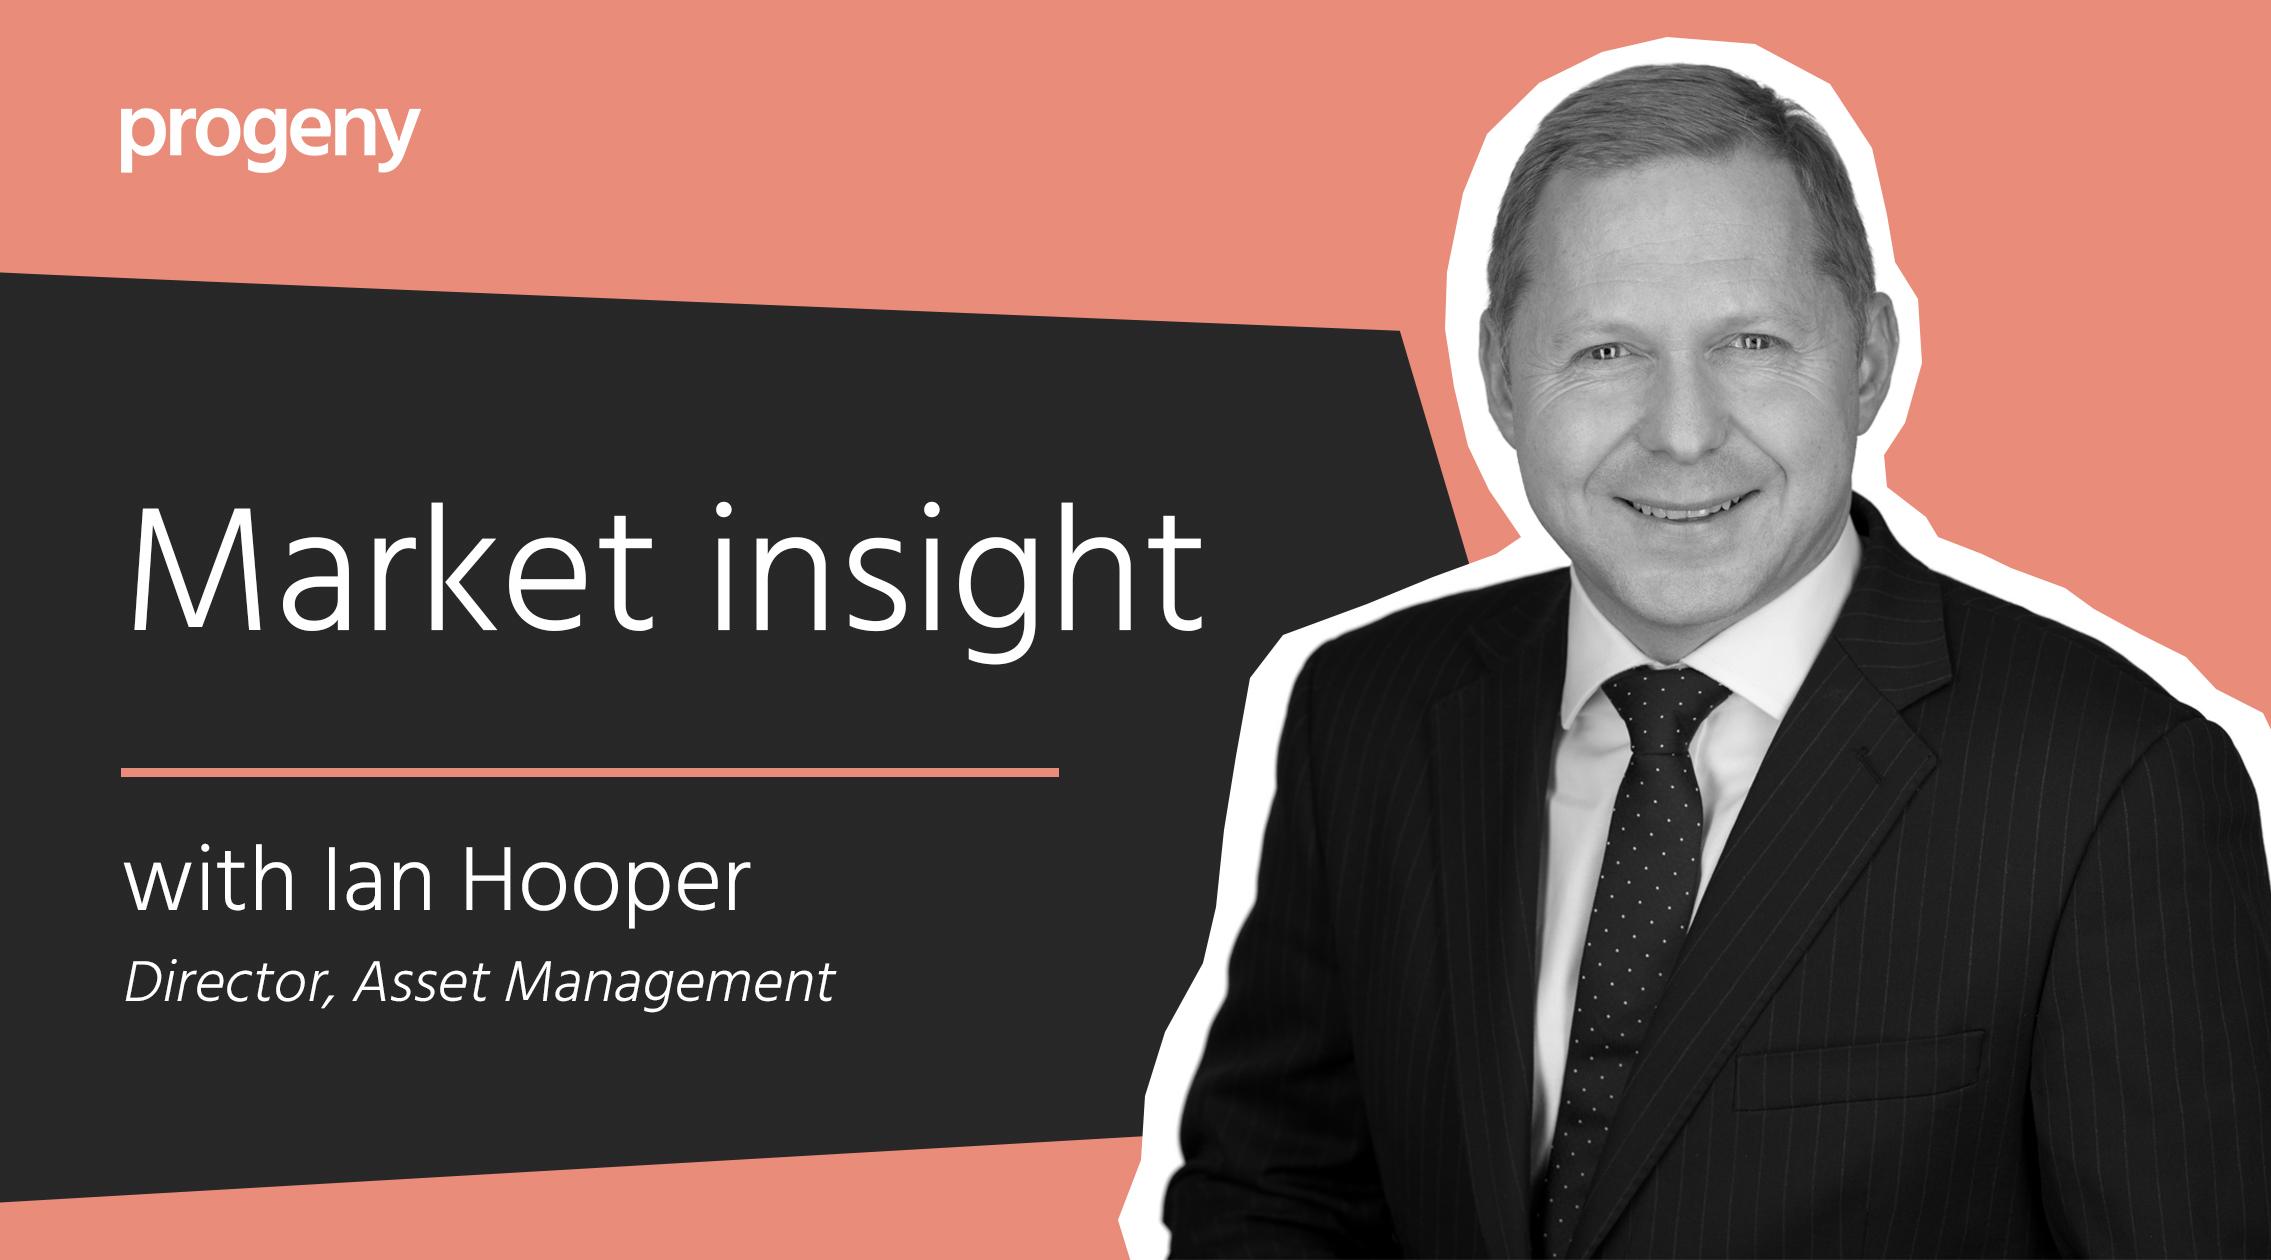 Market insight graphic